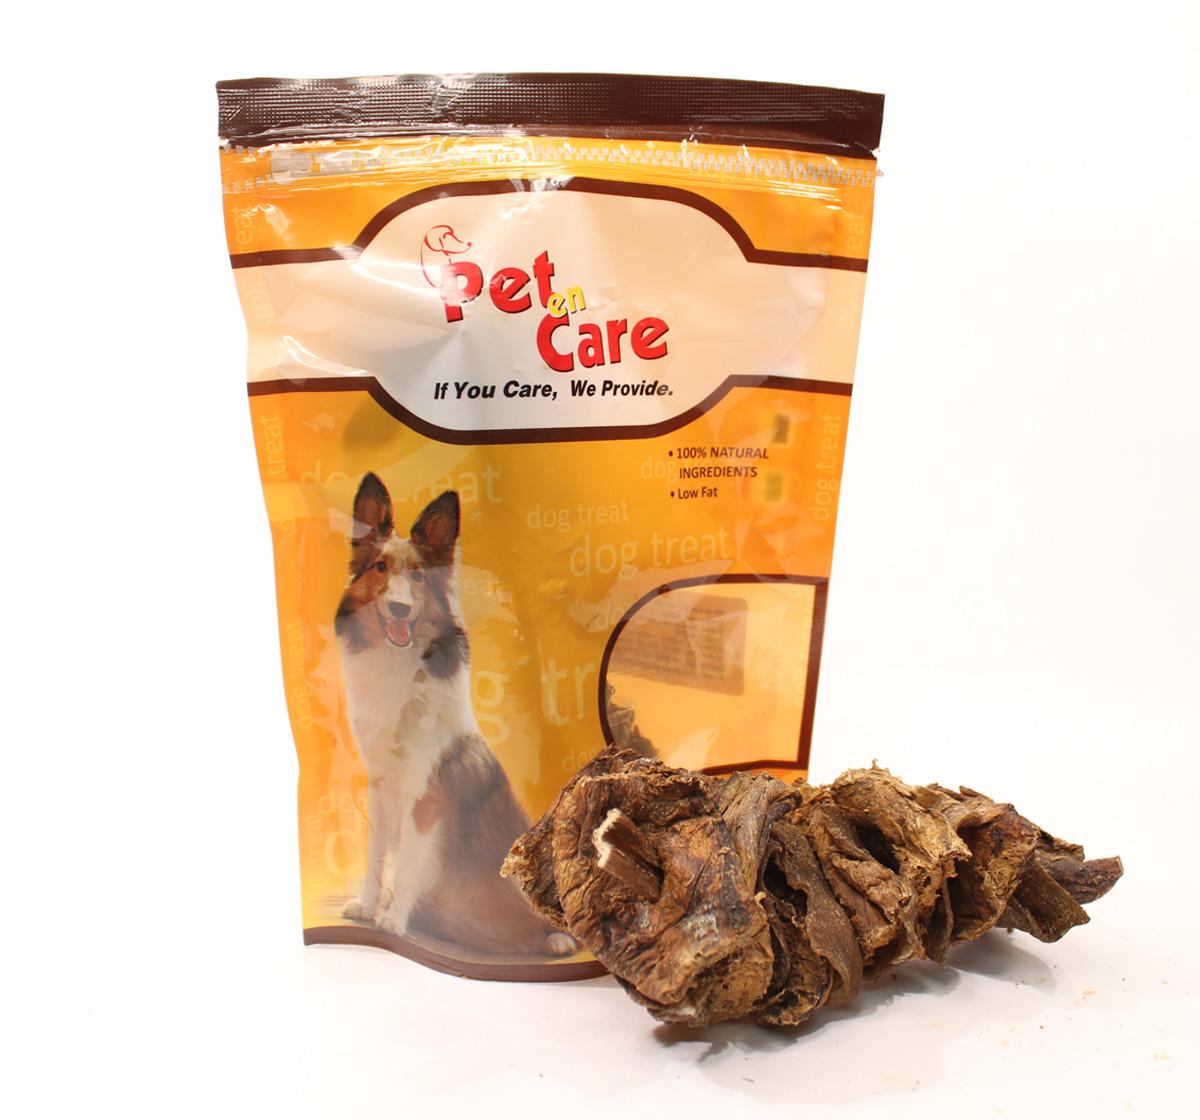 Pet en Care Kabab  - 1 Piece